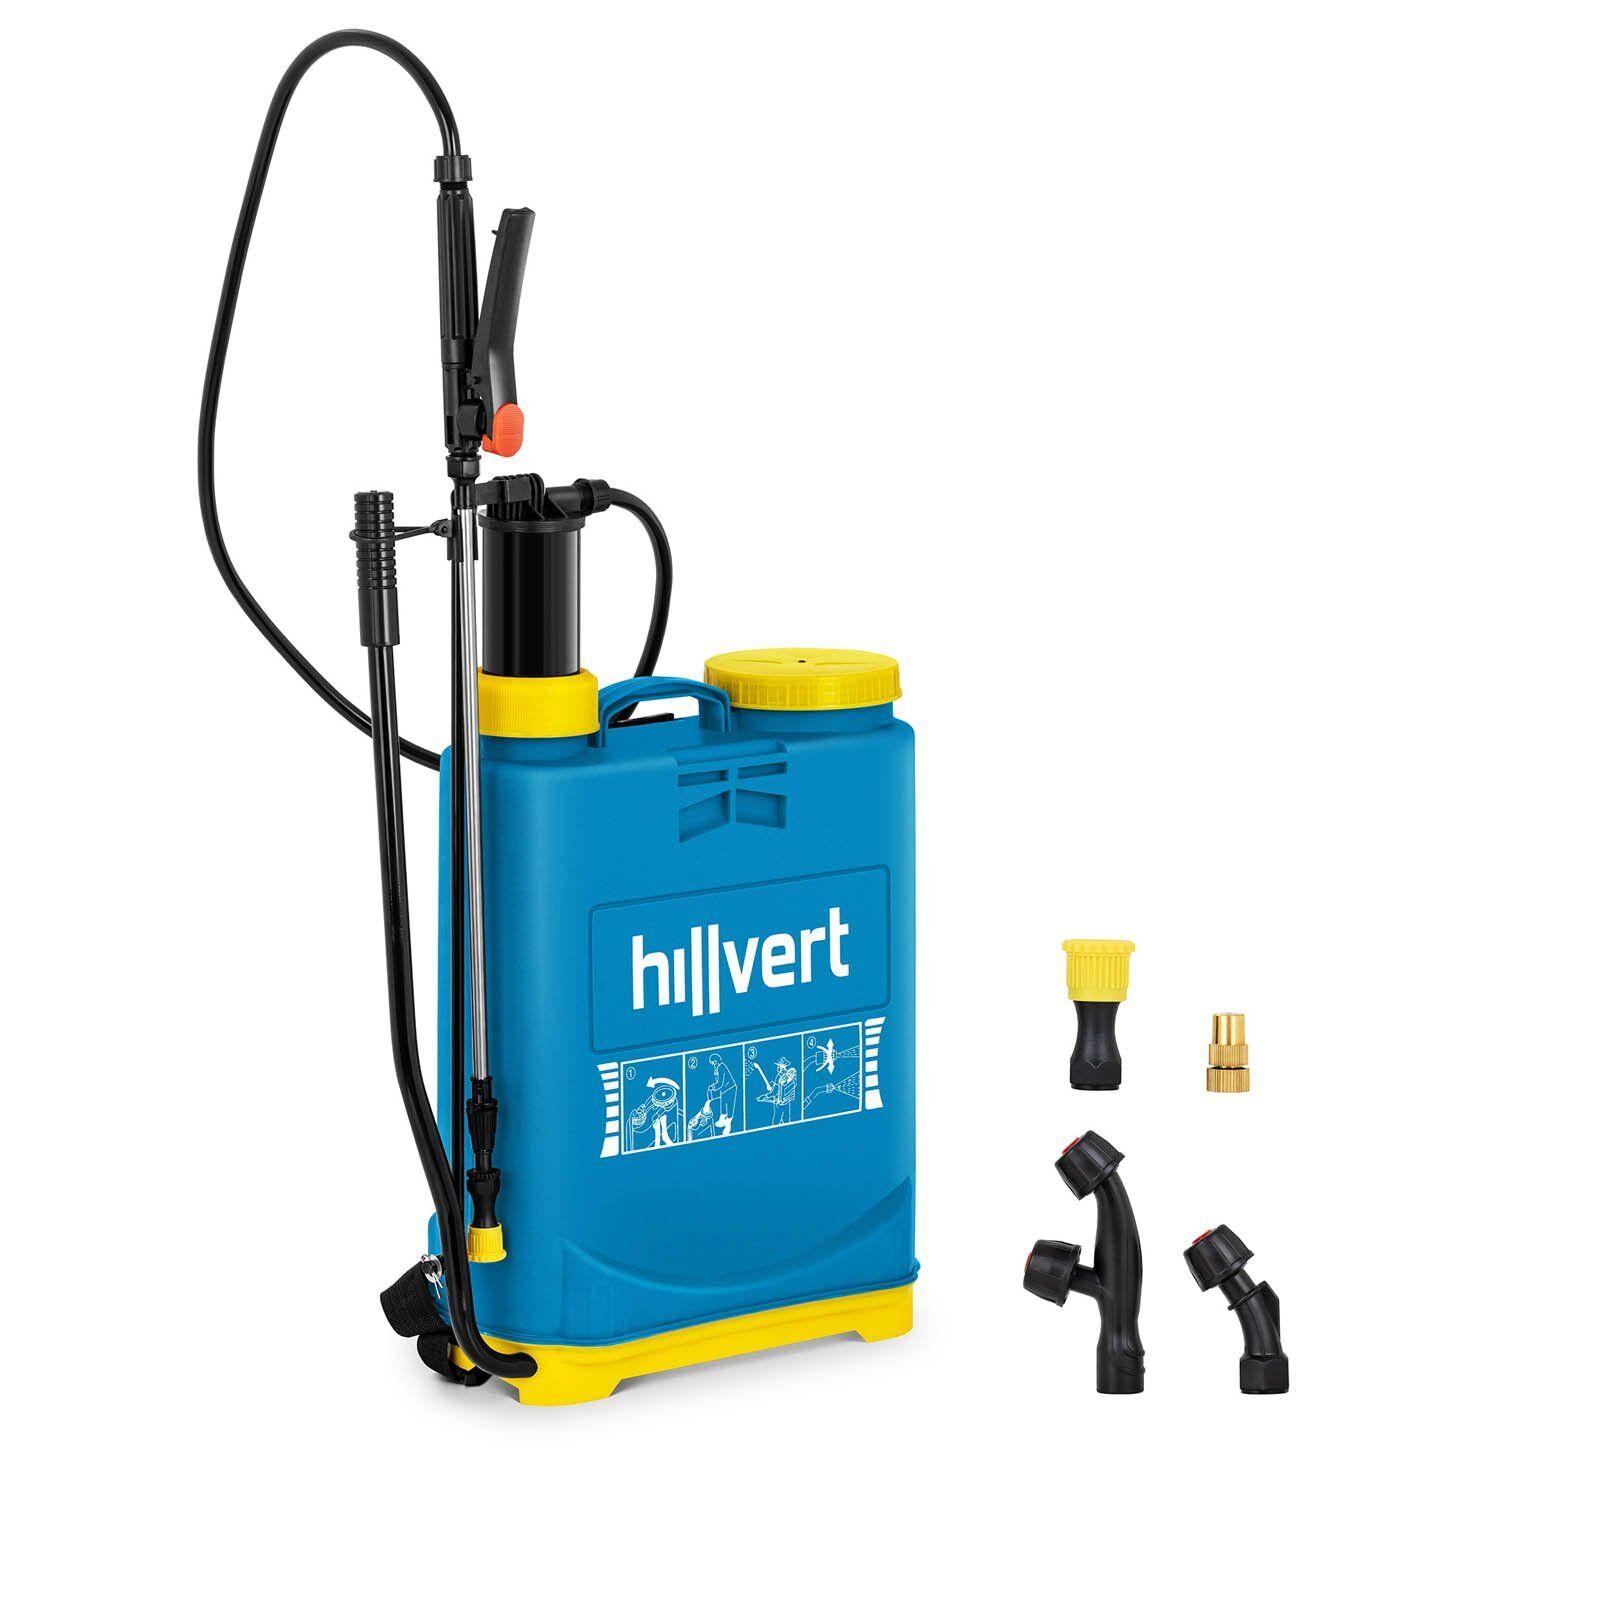 hillvert Trykksprøyte - 16 L